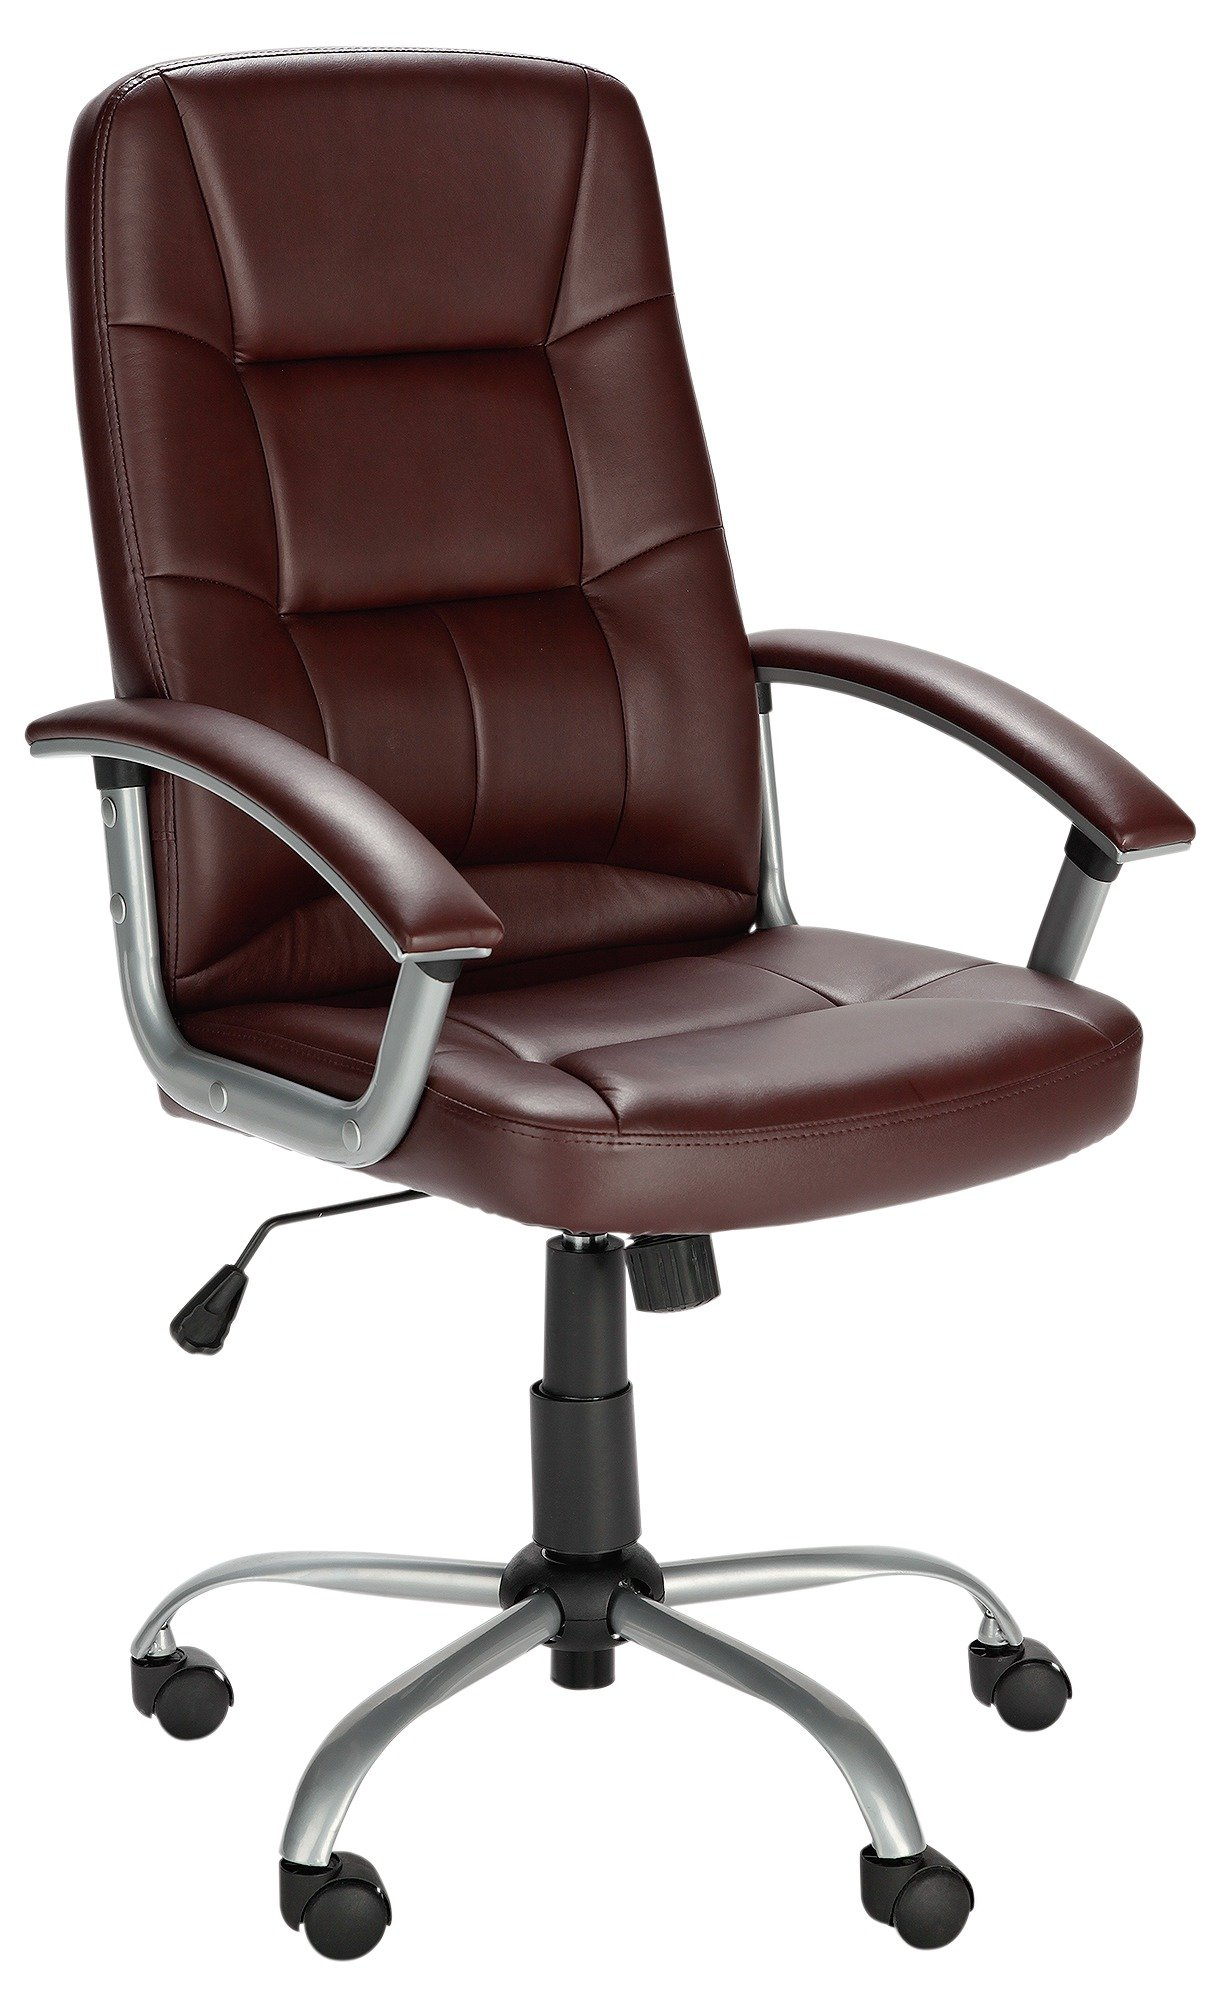 Walker Height Adjustable Office Chair   Brown451/9872